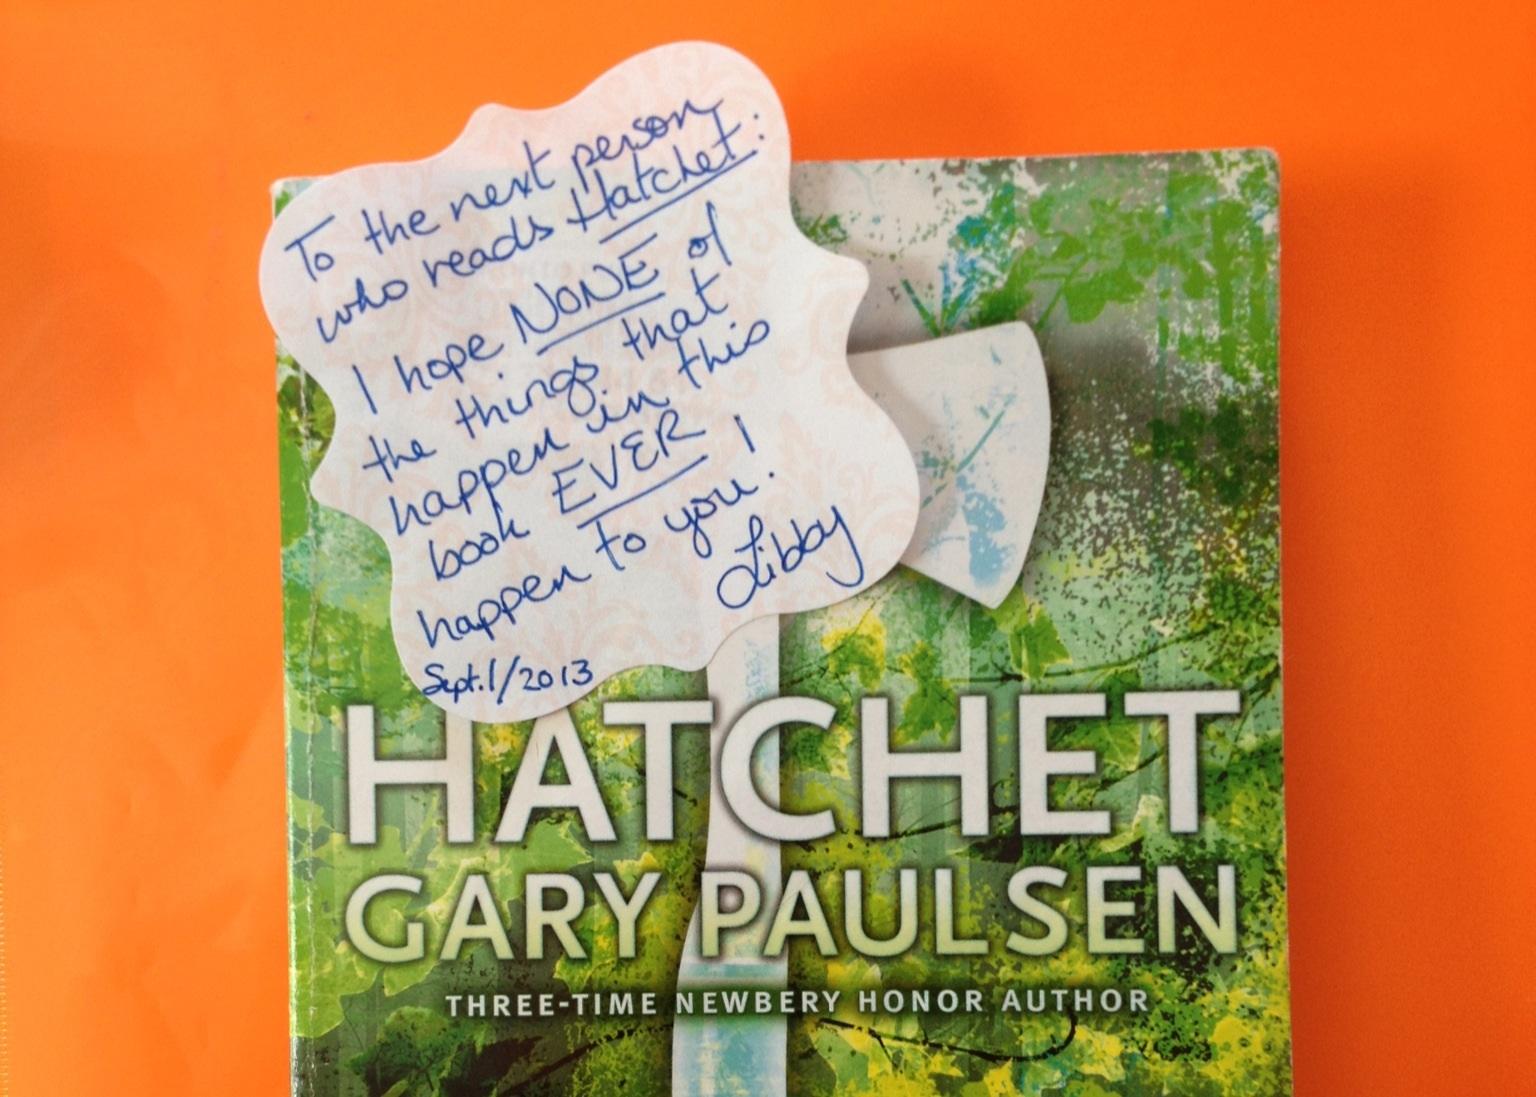 Gary Paulsen S Hatchet